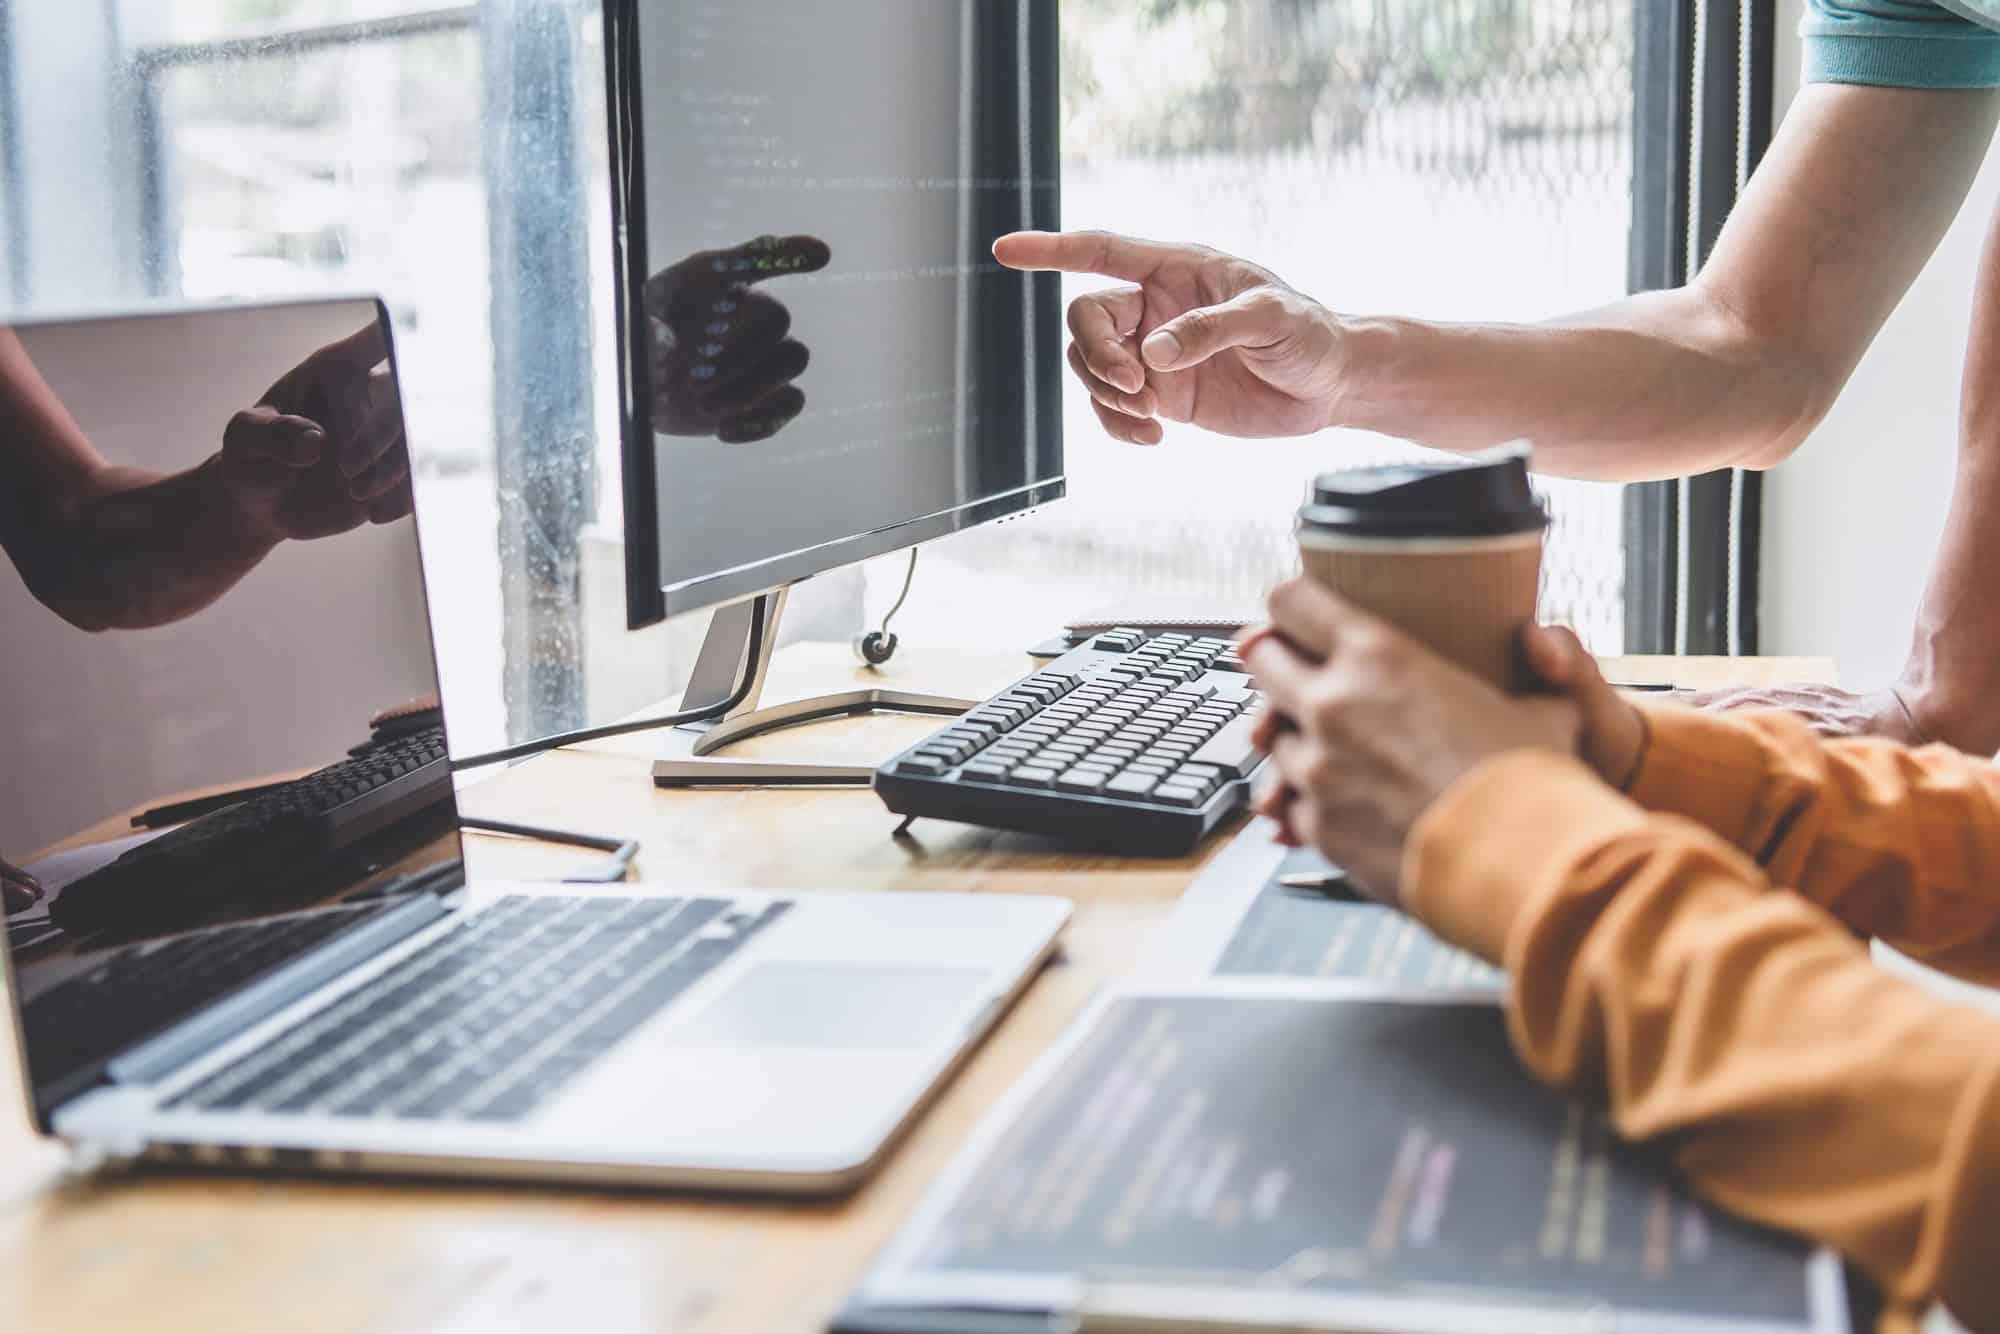 Considerations When Choosing Between a Laptop vs. Desktop